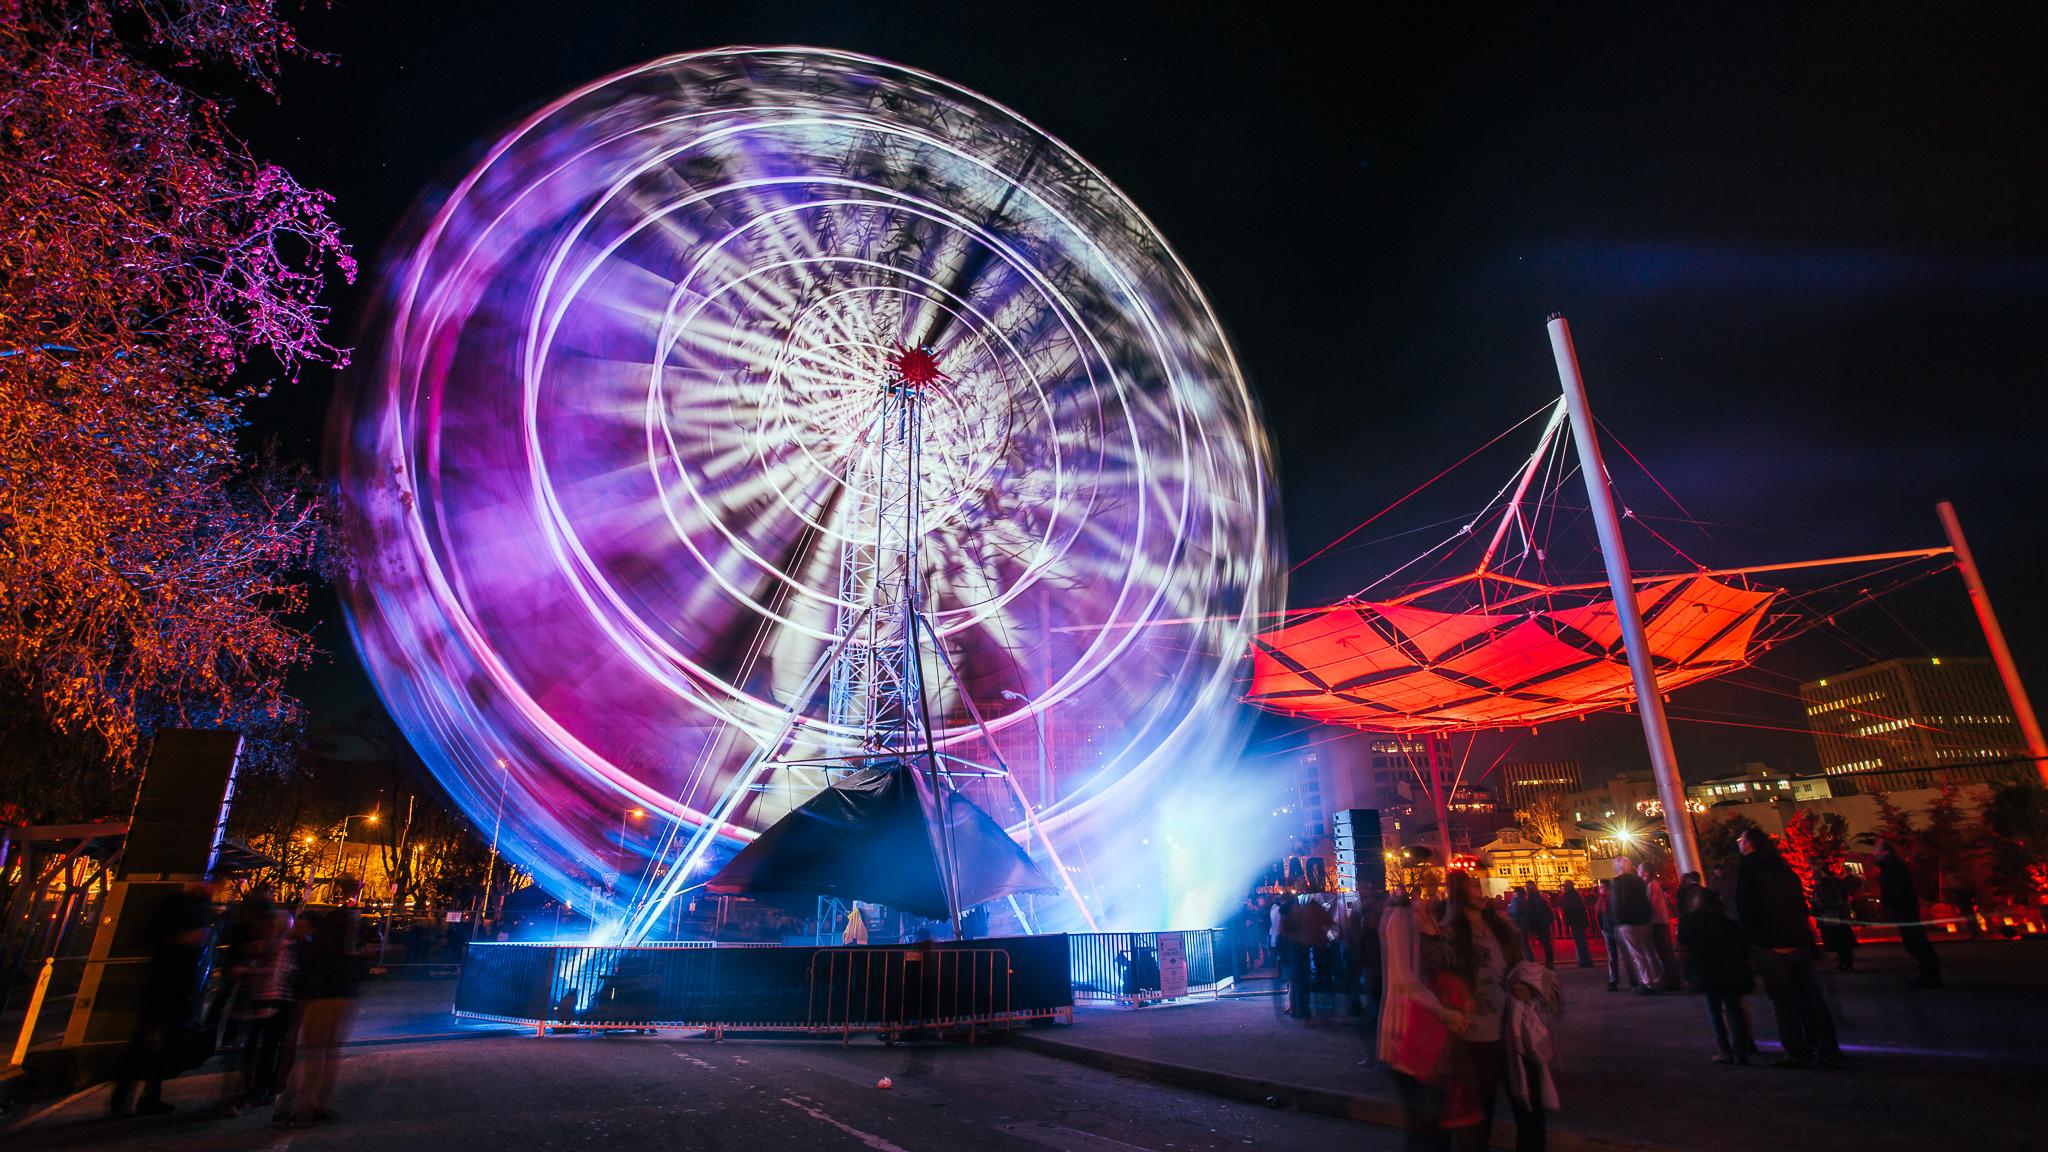 Ferris Wheel of Death